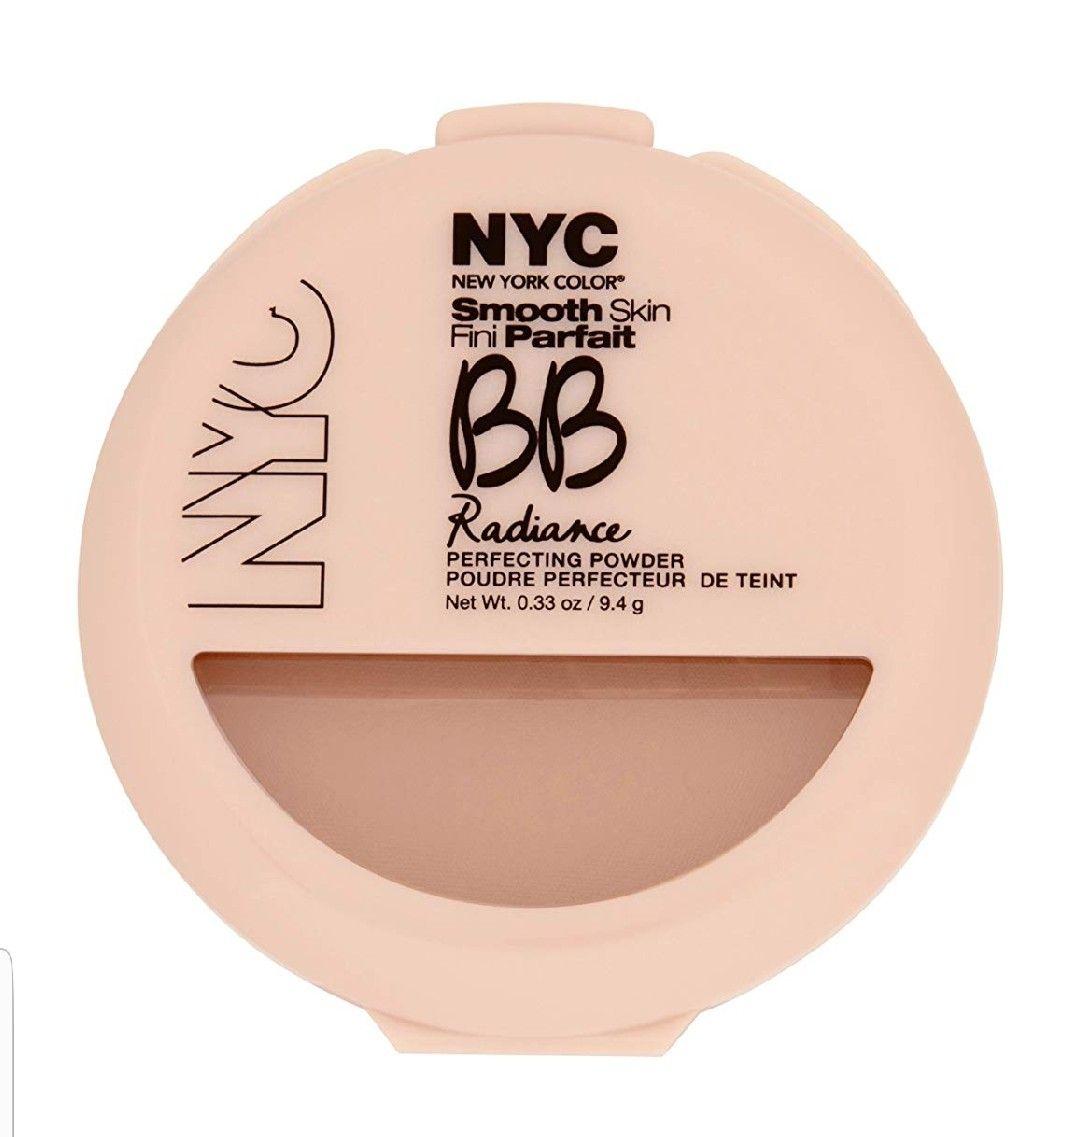 Polvos NYC Smooth Skin Warm beige PLUS.